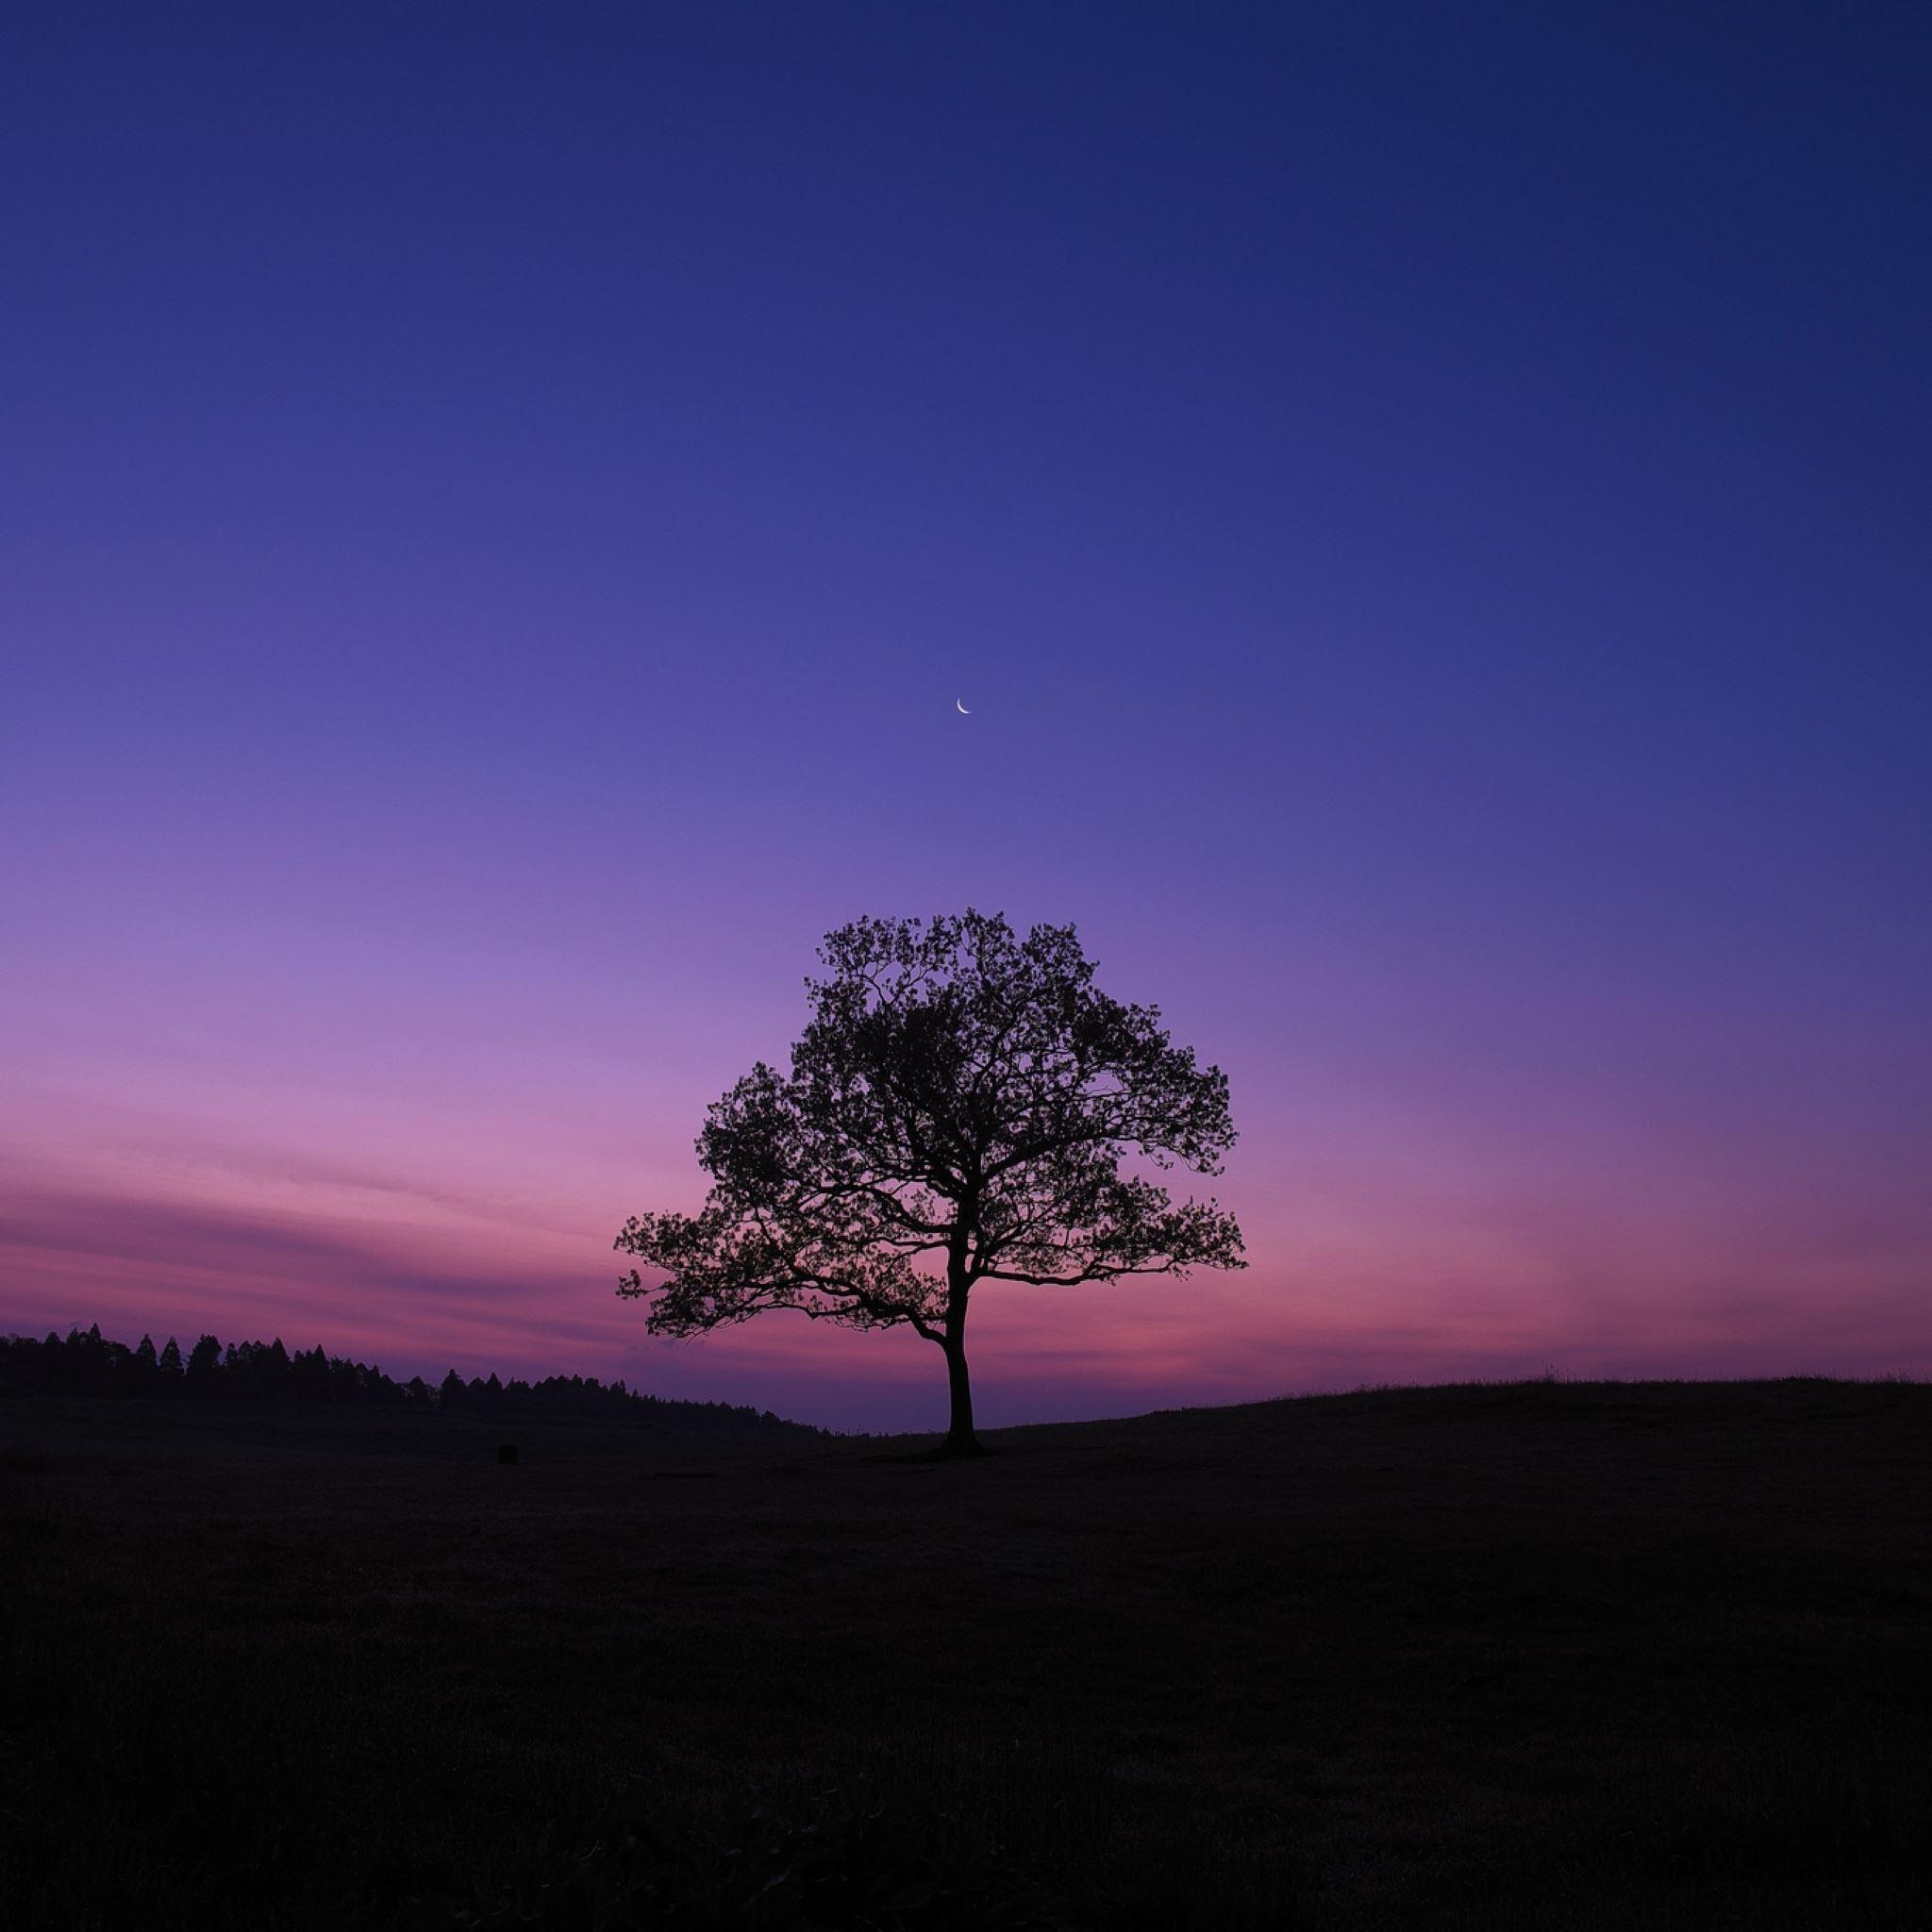 Amazing Wallpaper Night Ipad - Tree-night-moon-sky-lonely-ipad-air-wallpaper-ilikewallpaper_com  Trends-603550.jpg